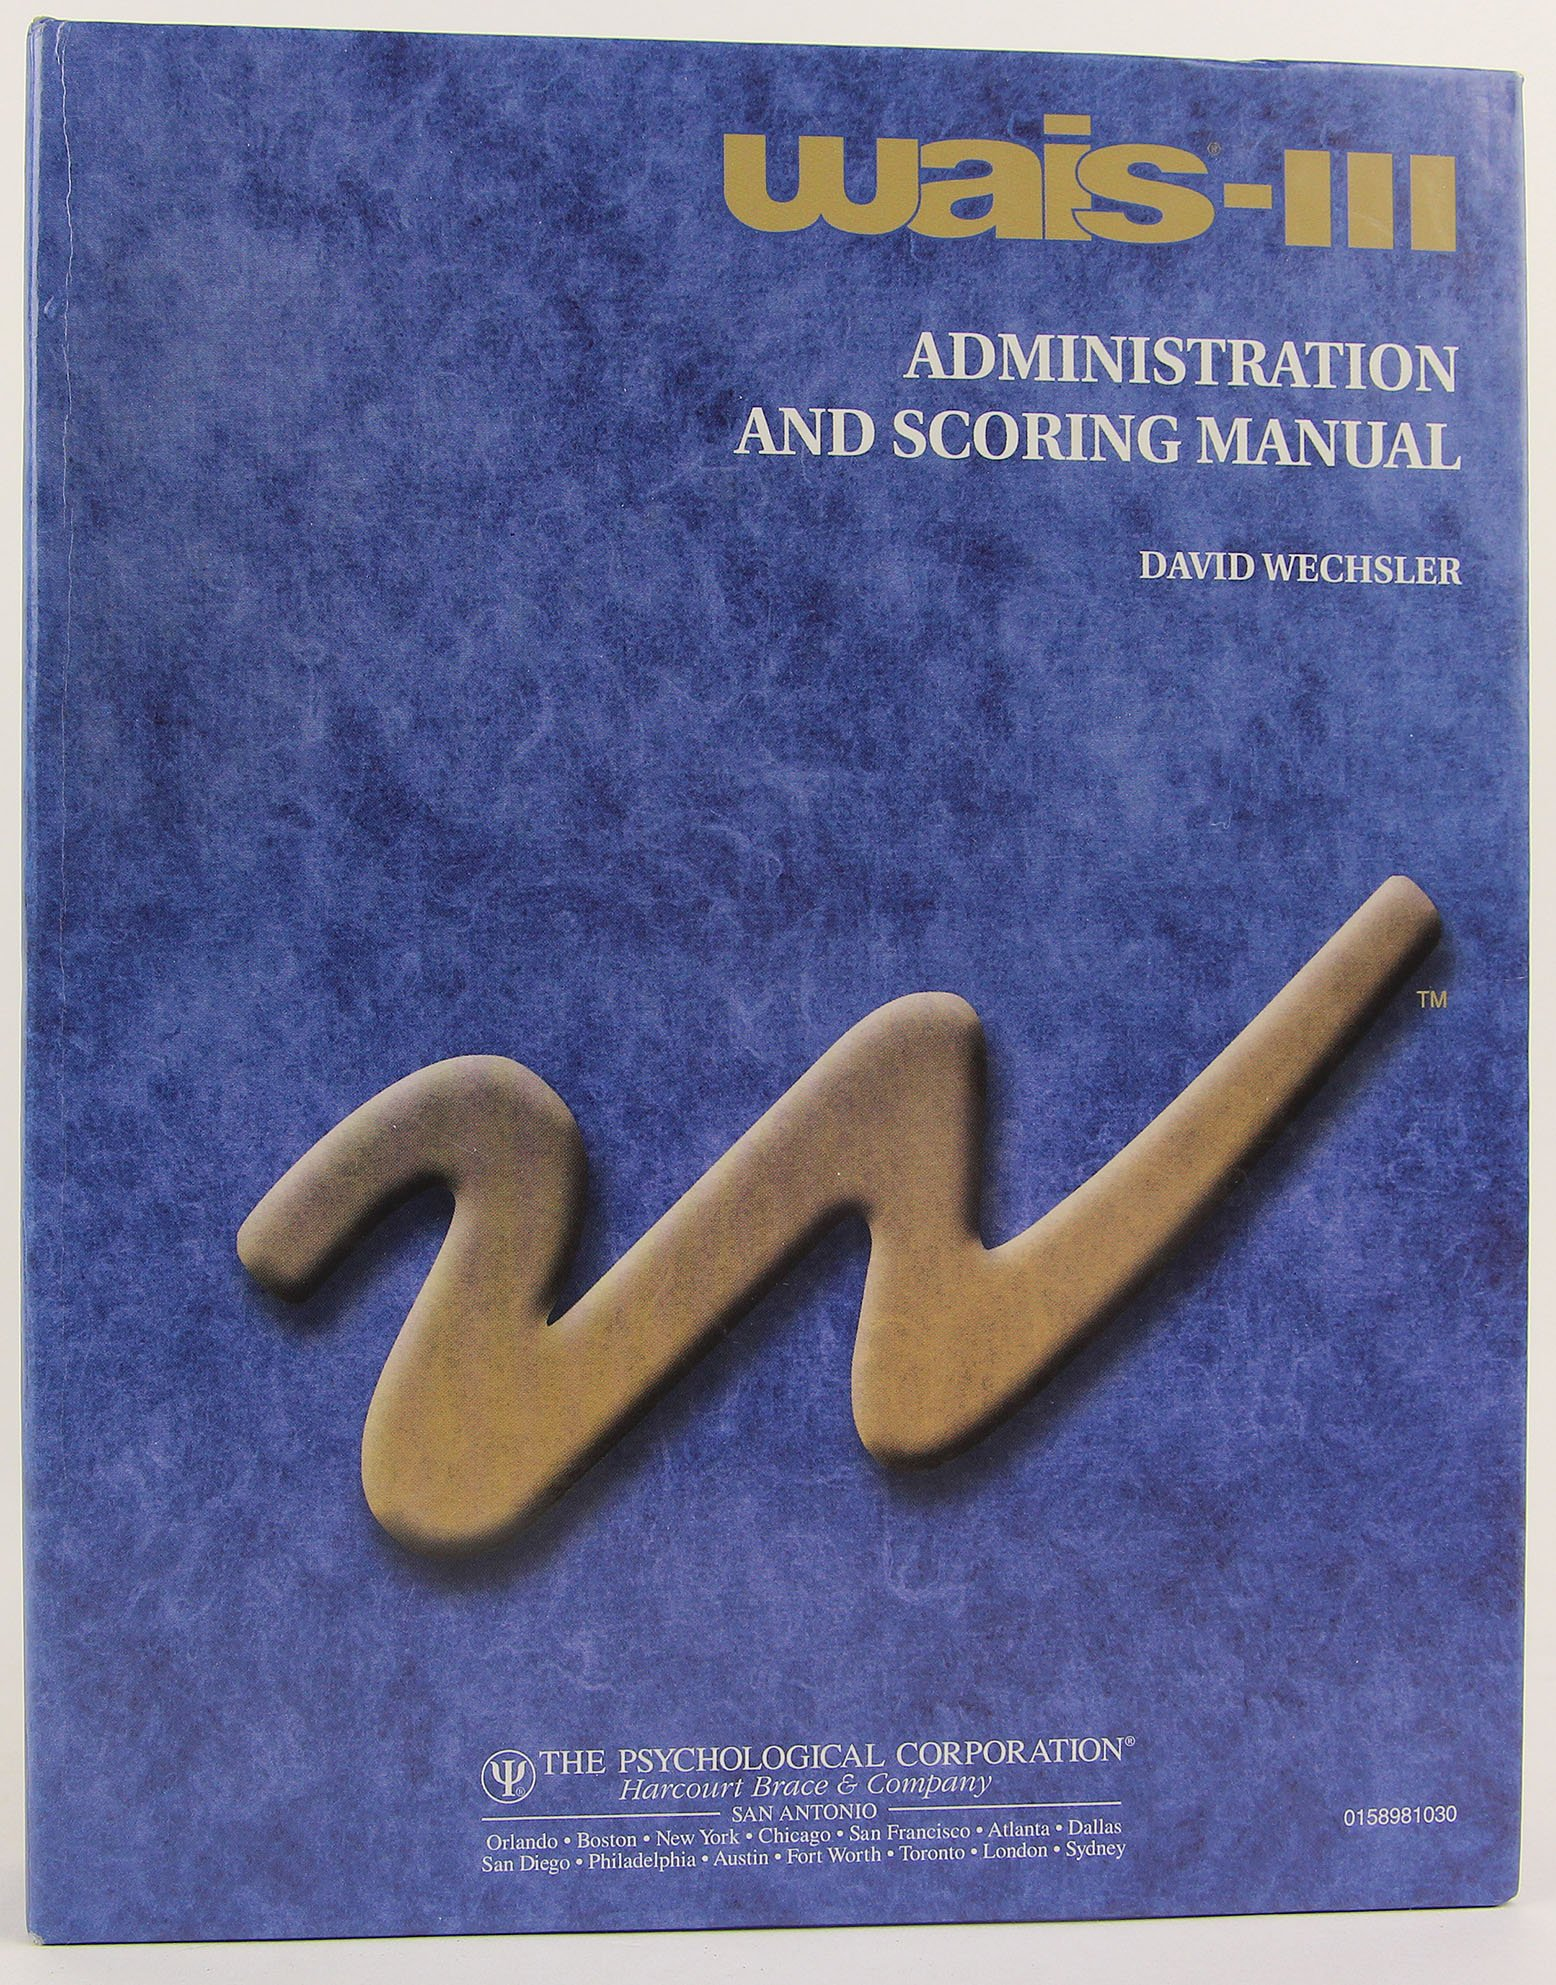 Wais-3 Administration and Scoring Manual: David Wechsler: 9780158981031:  Amazon.com: Books